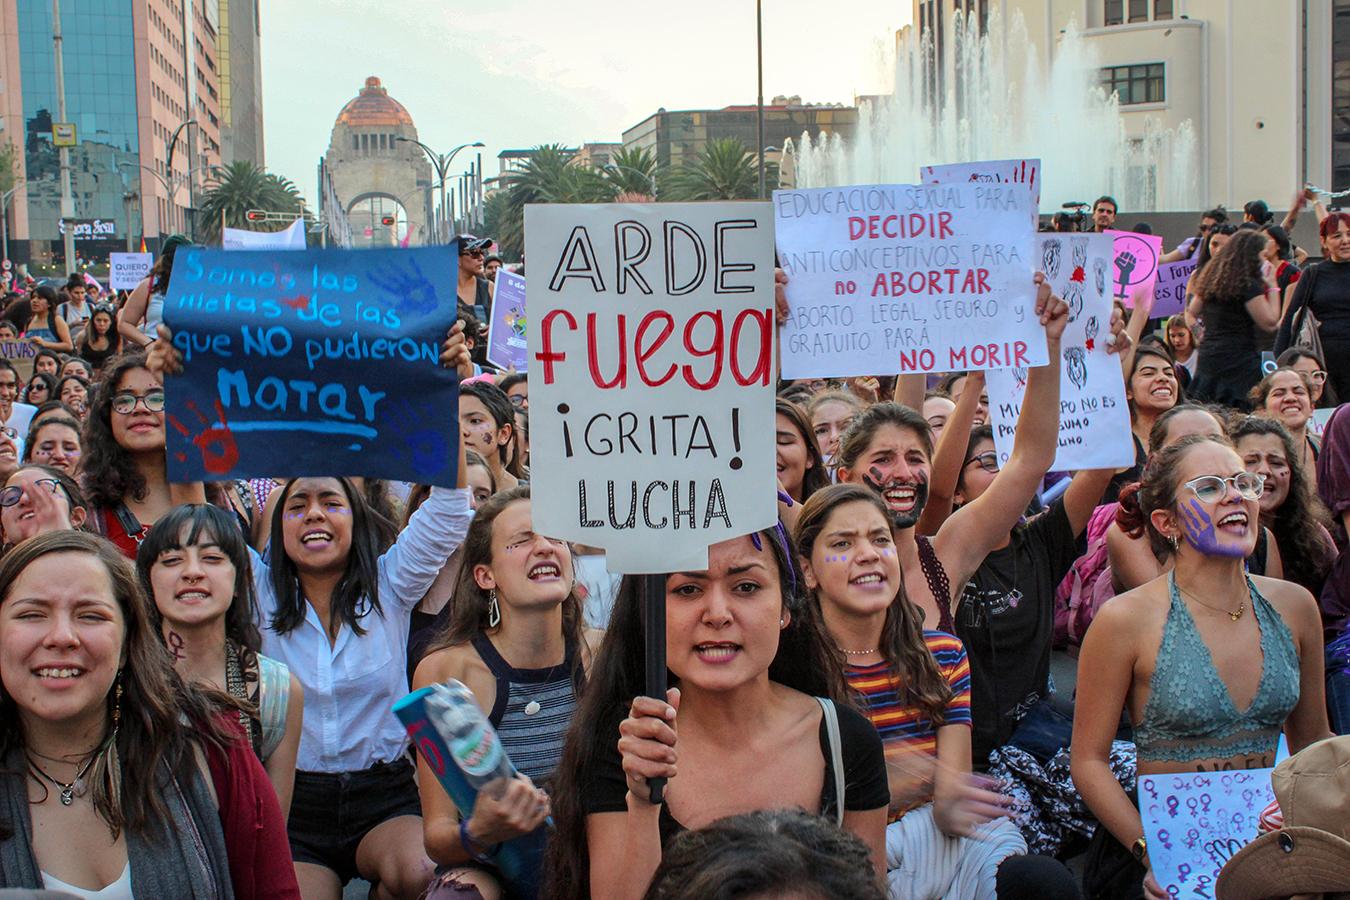 Foto: Daniela Hernández/Somoselmedio.org